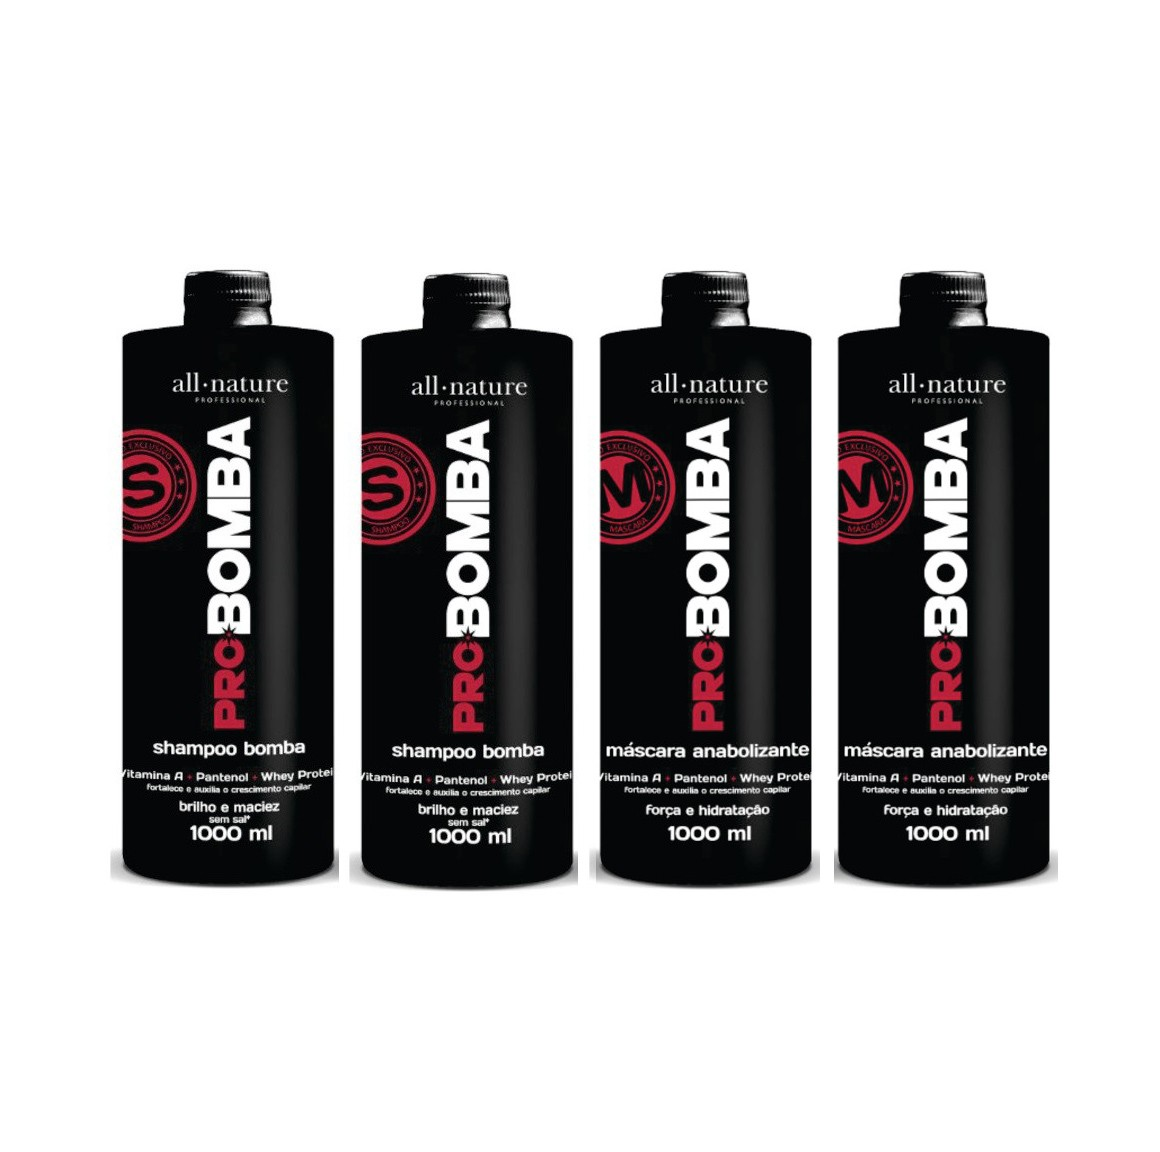 Pro Bomba, Contém Vitamina A, Pantenol, Whey protein e Mix de Aminoácidos Que Fortalece e Auxilia no Crescimento - All Nature 4 unids